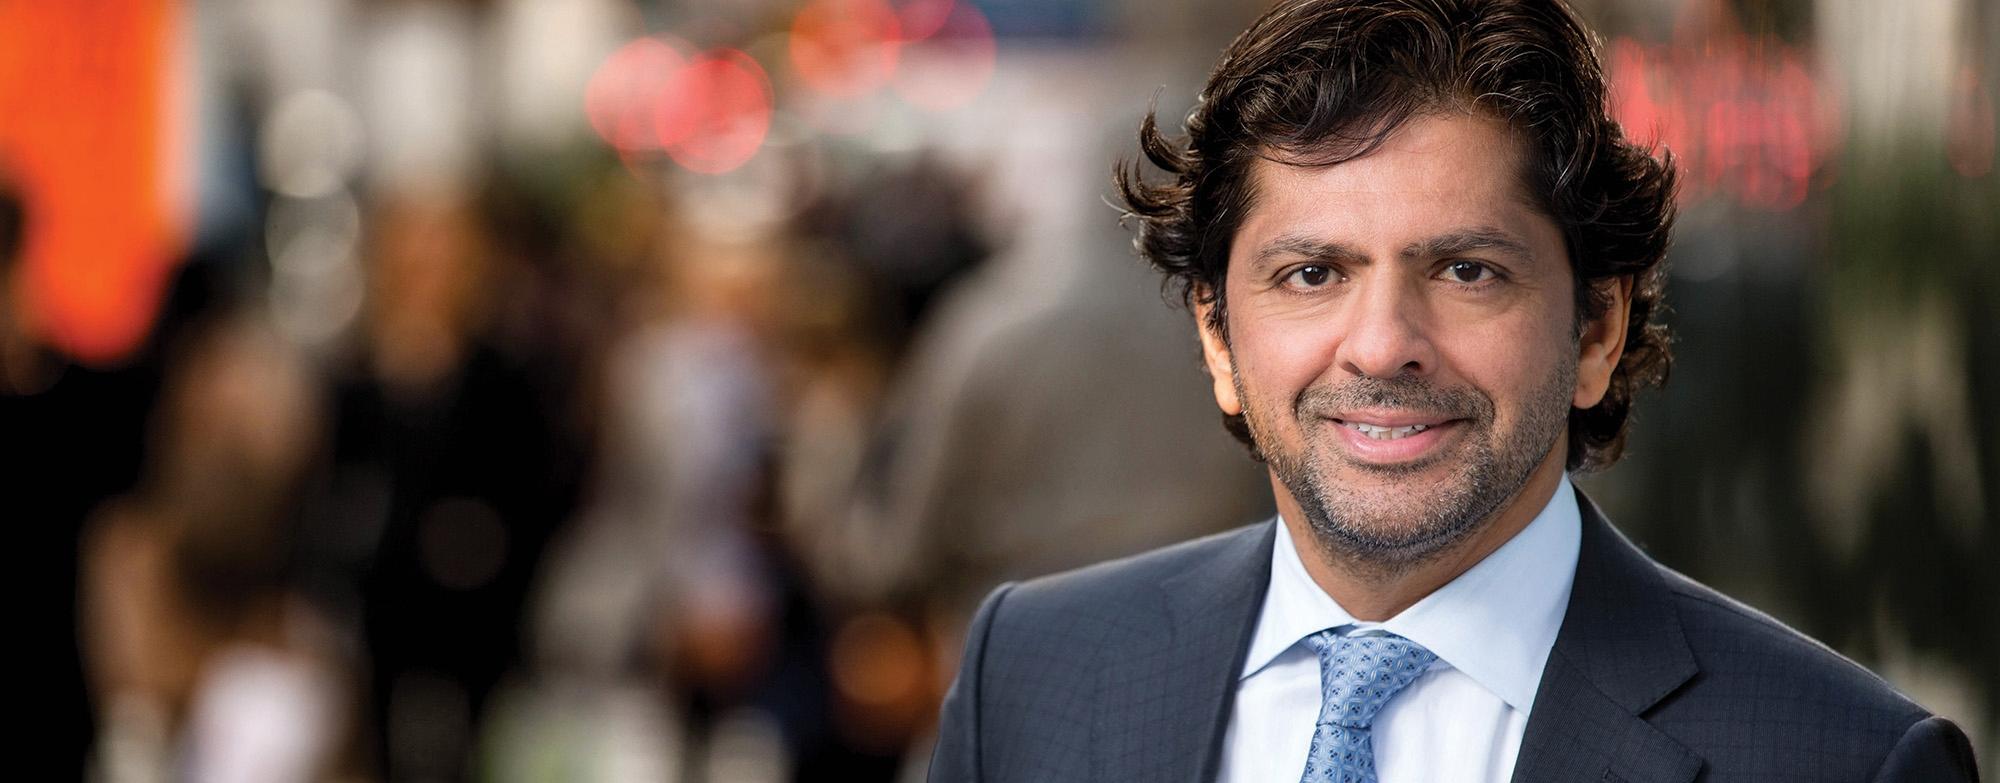 Reaz Jafri, CEO